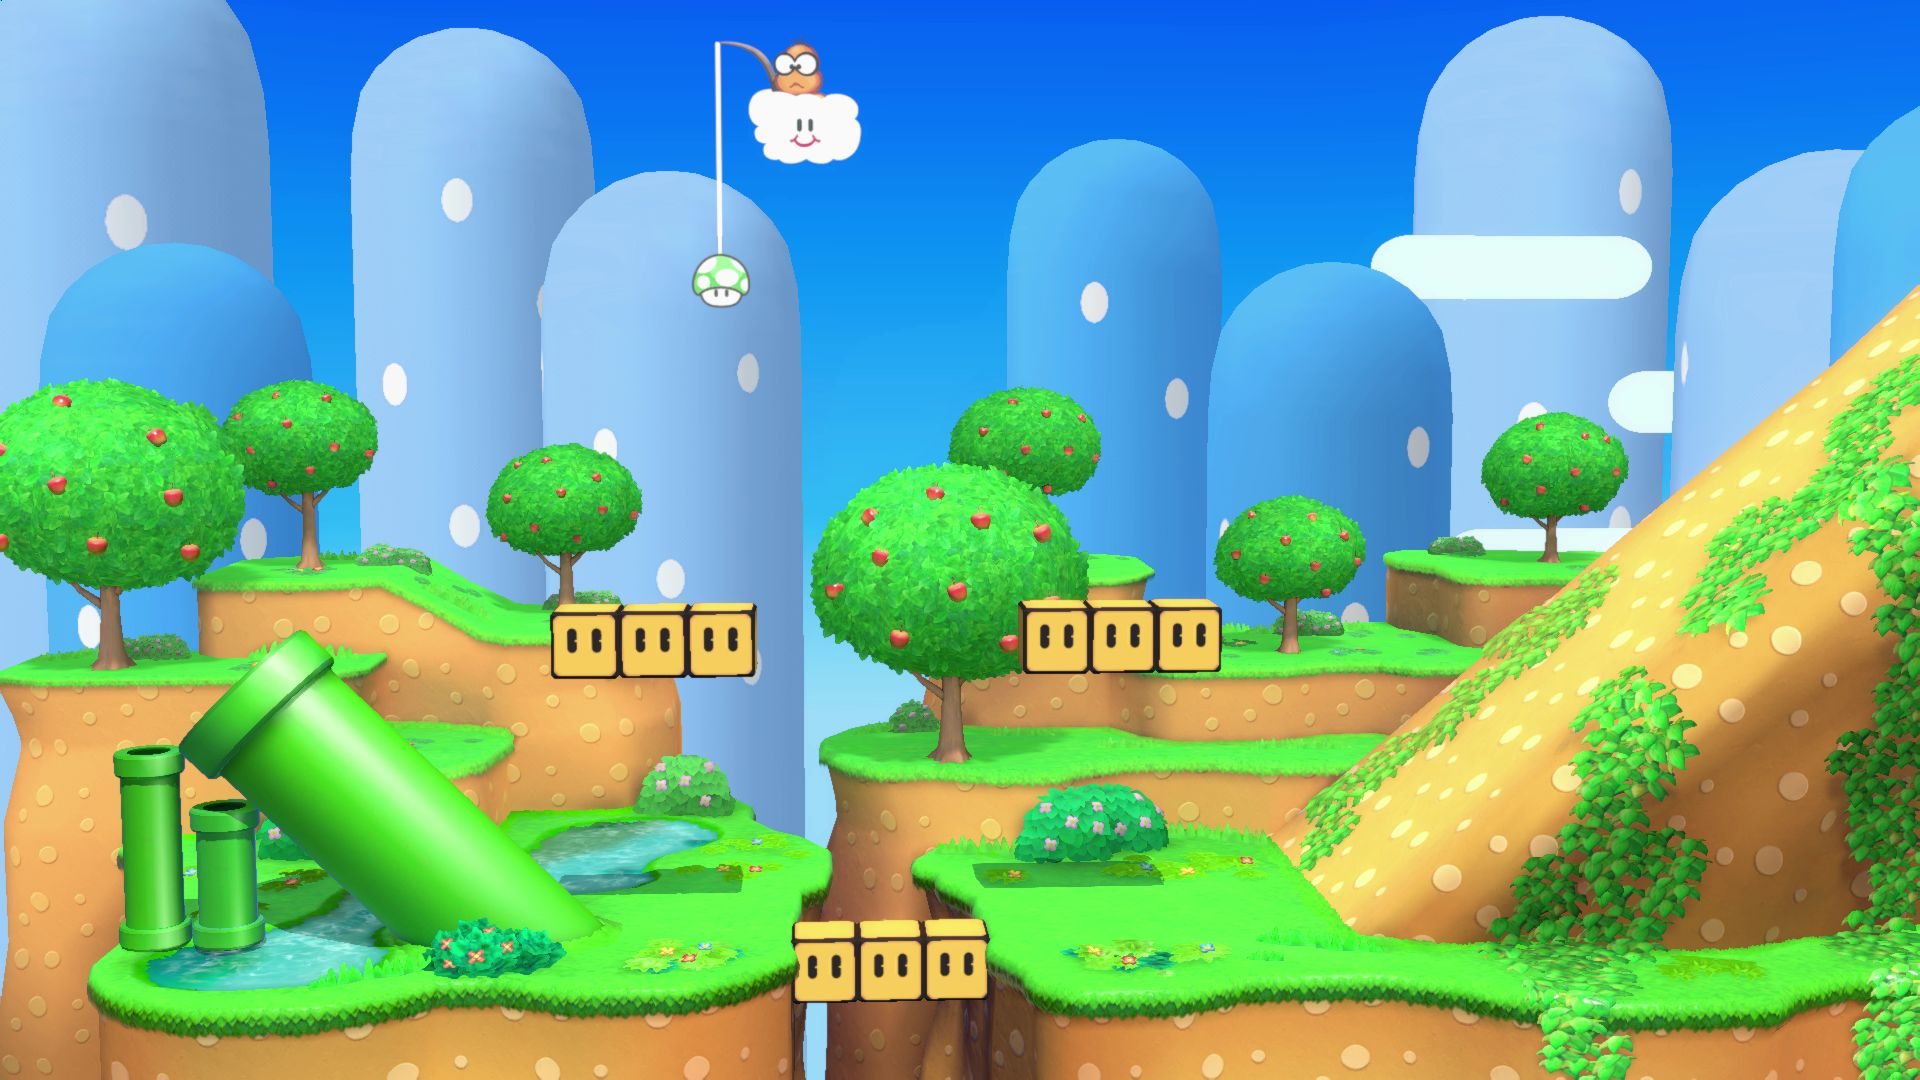 Yoshi's Island (Super Smash Bros. Melee)